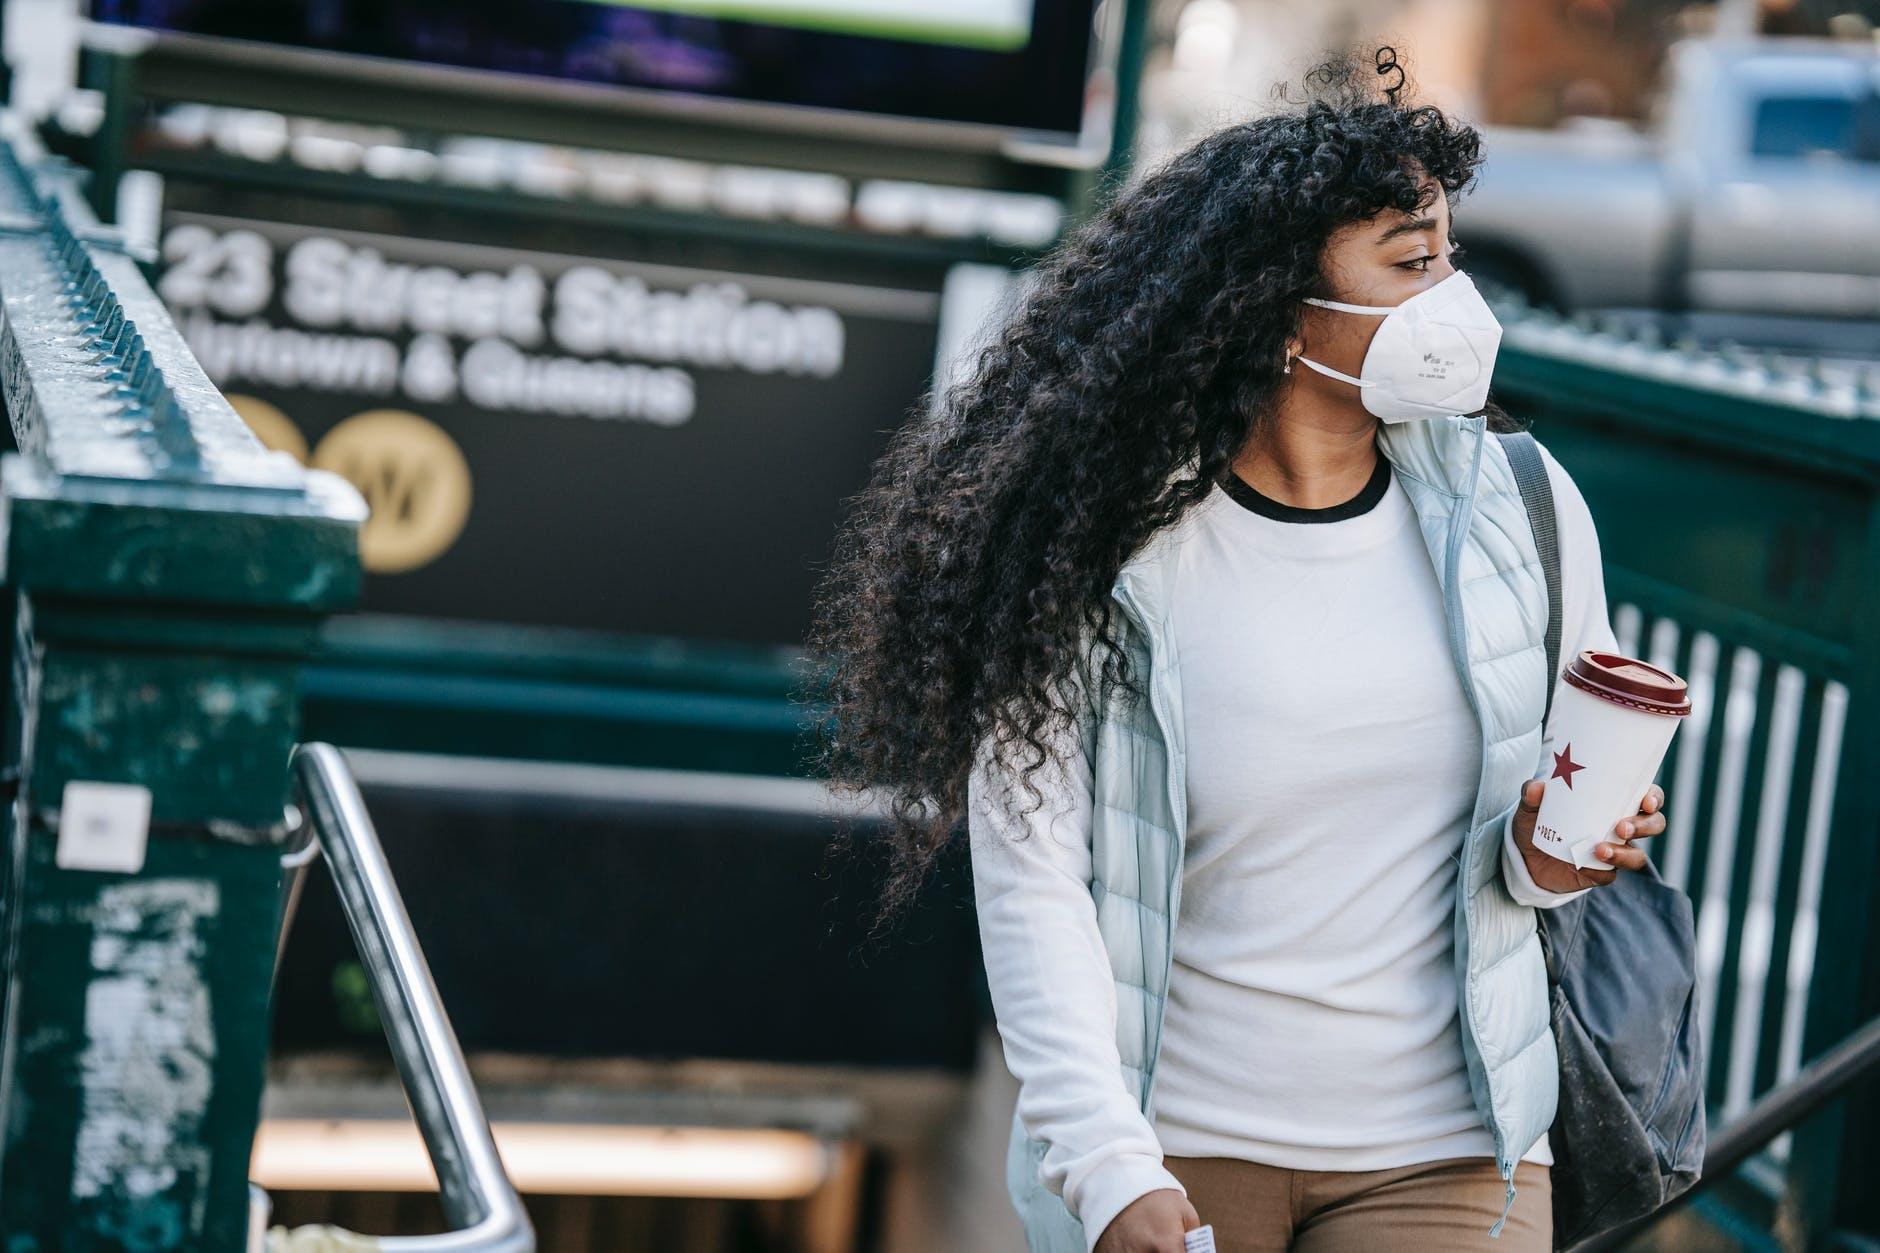 black woman with takeaway coffee leaving metro station